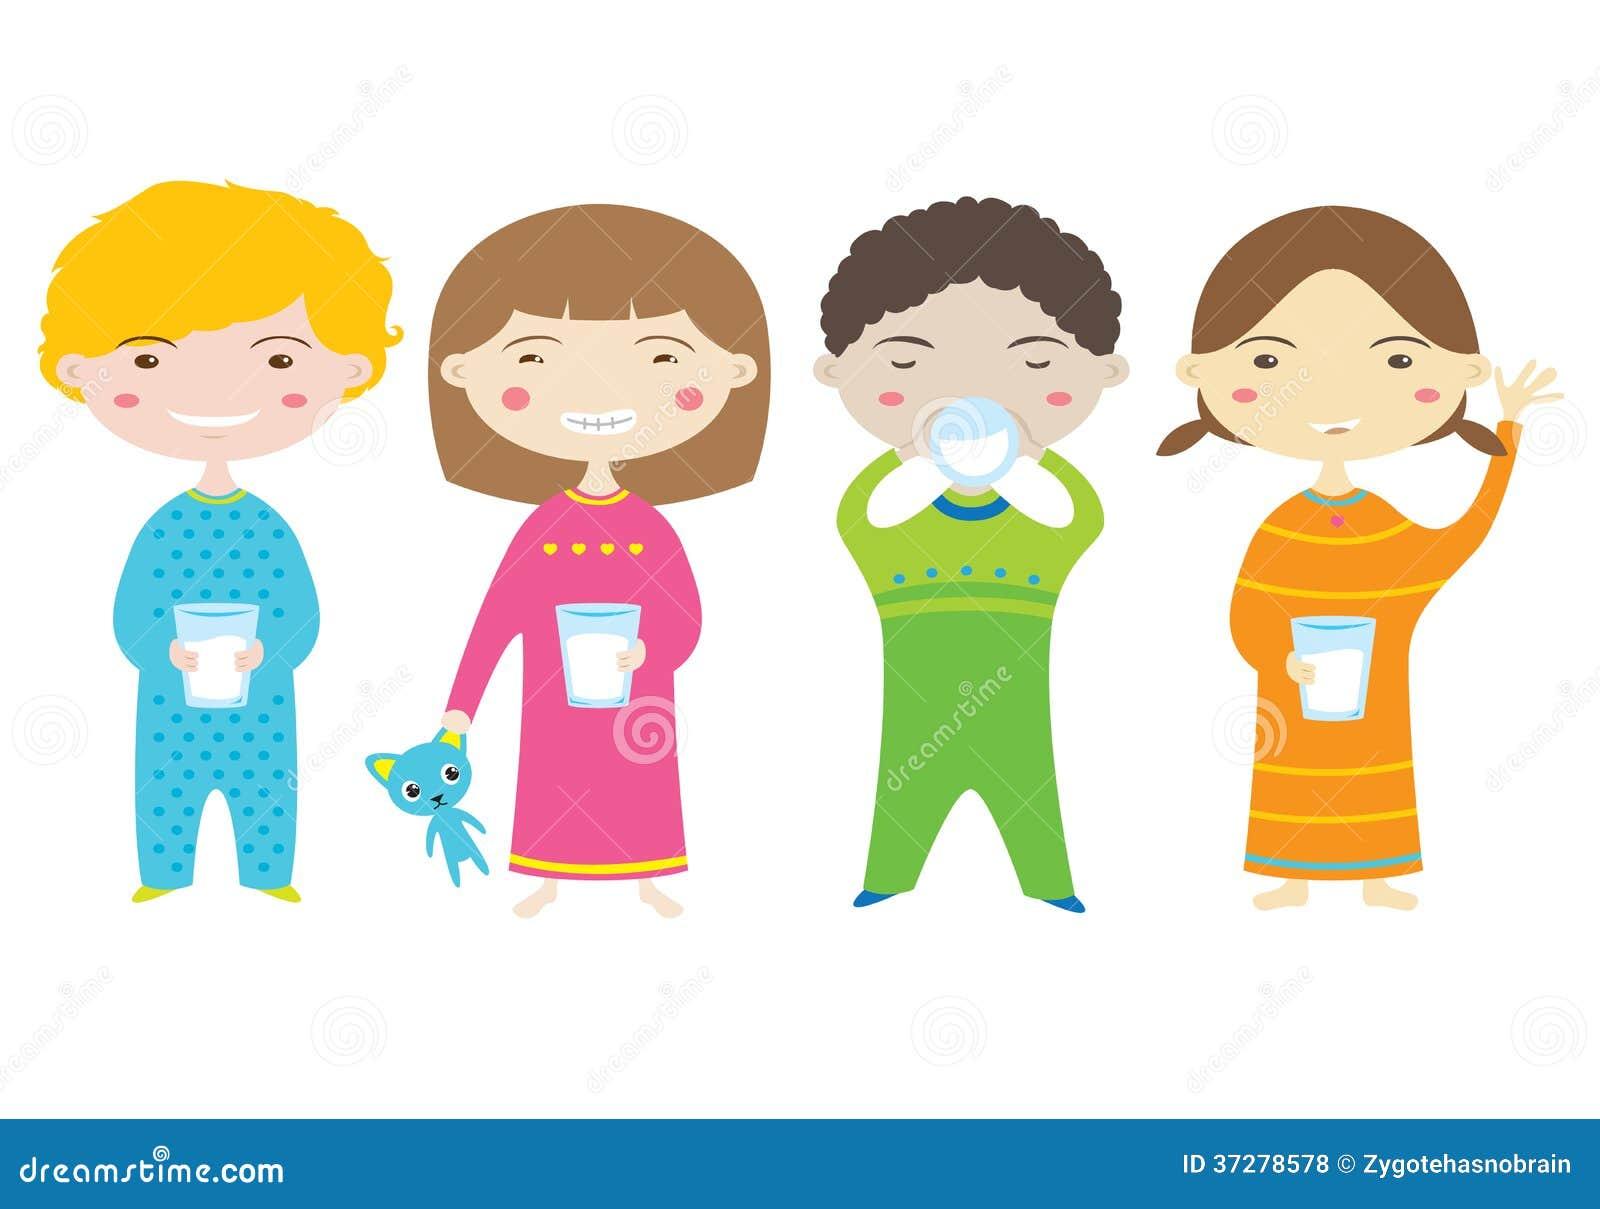 children drinking milk stock illustrations – 92 children drinking